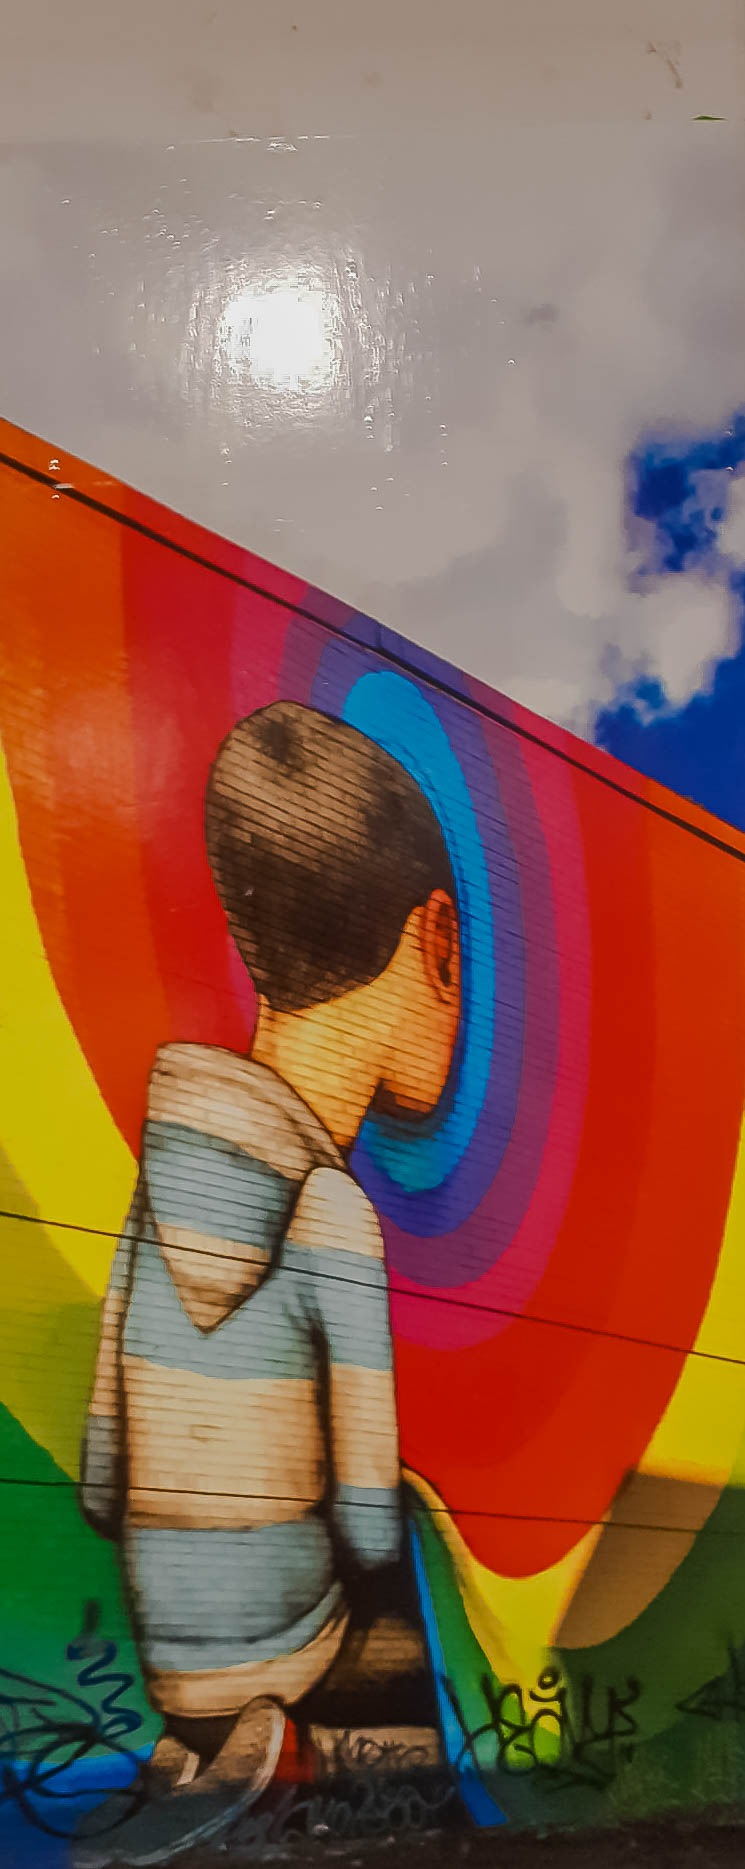 Street Art by William Richardson